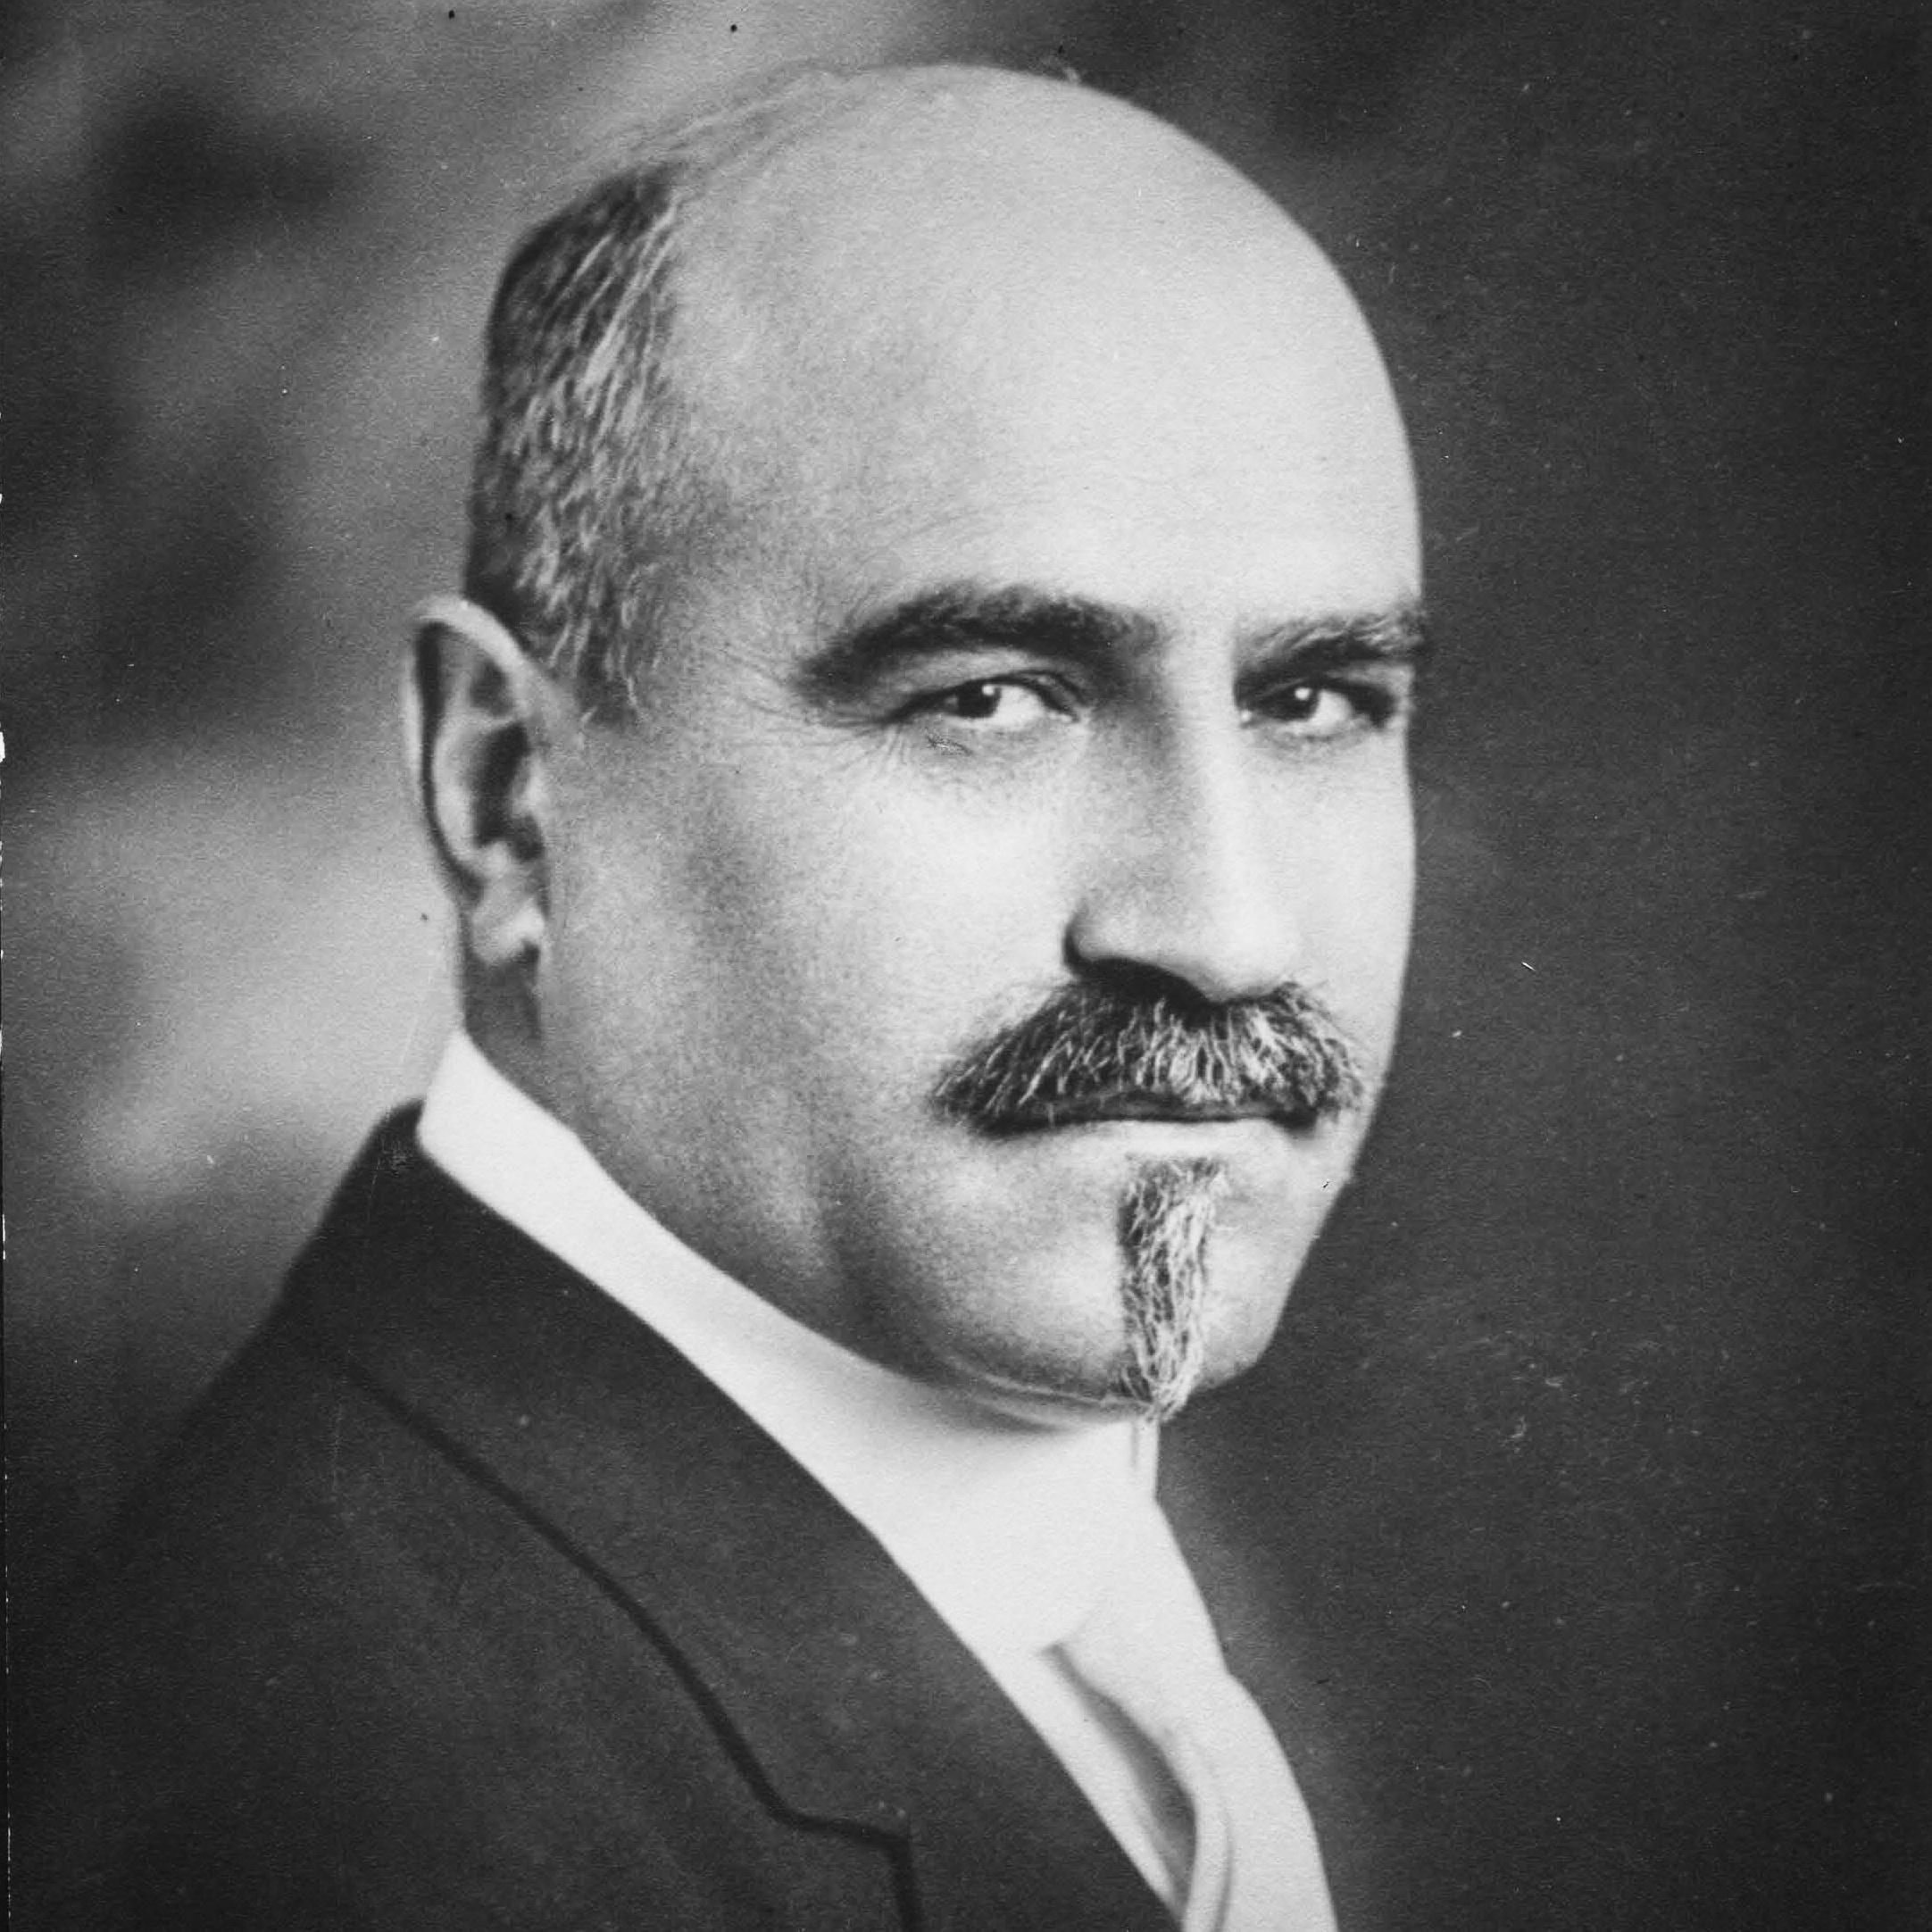 Rev. M. G. Papazian 1908-1914